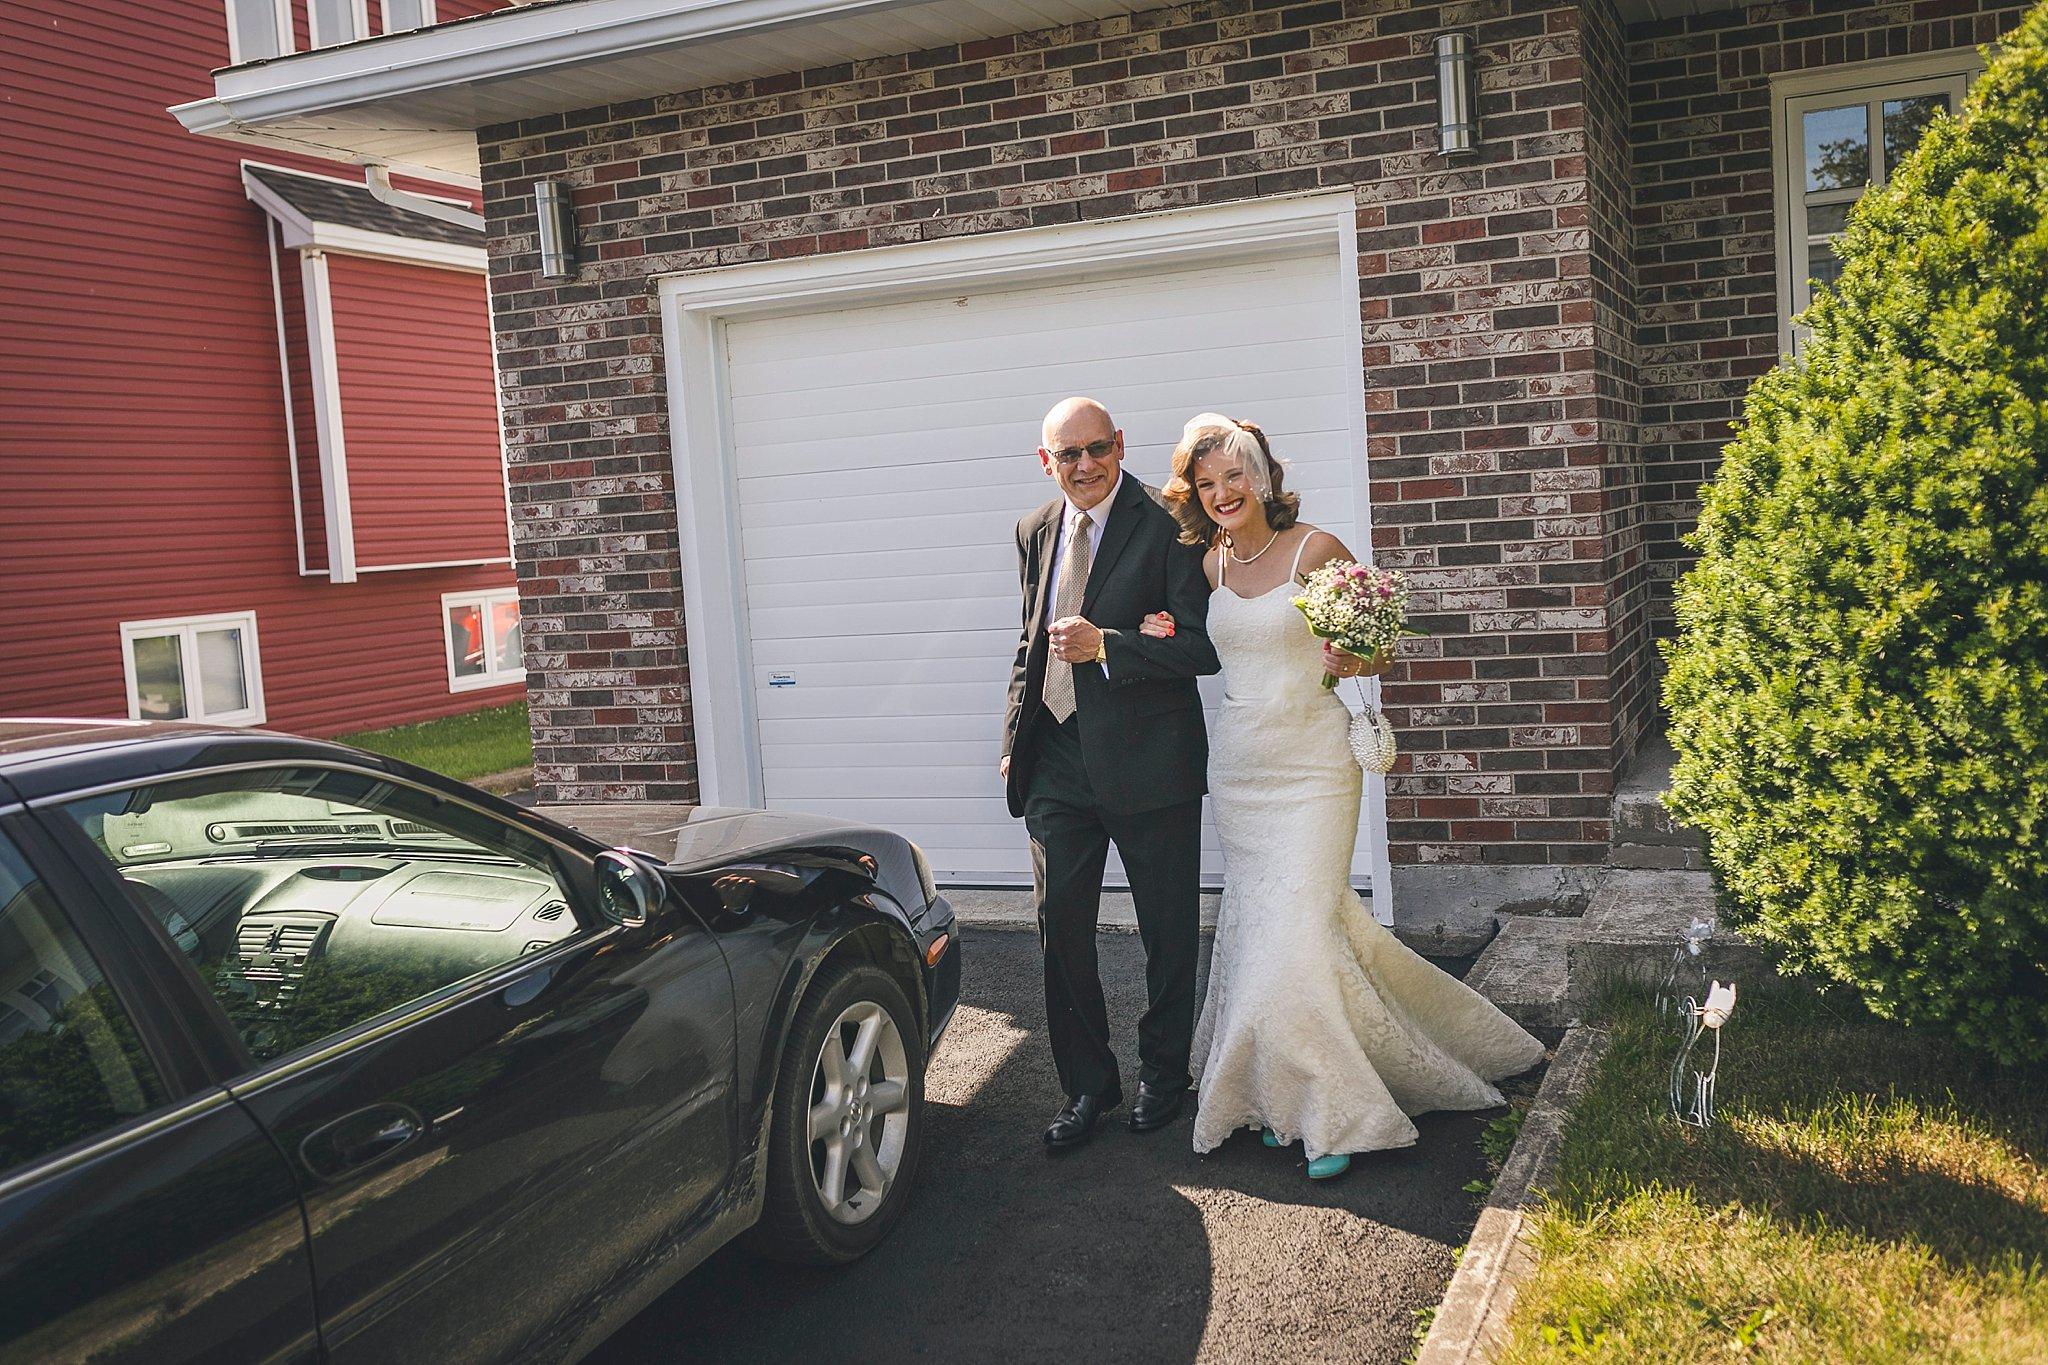 wedding held in St. John's, Newfoundland